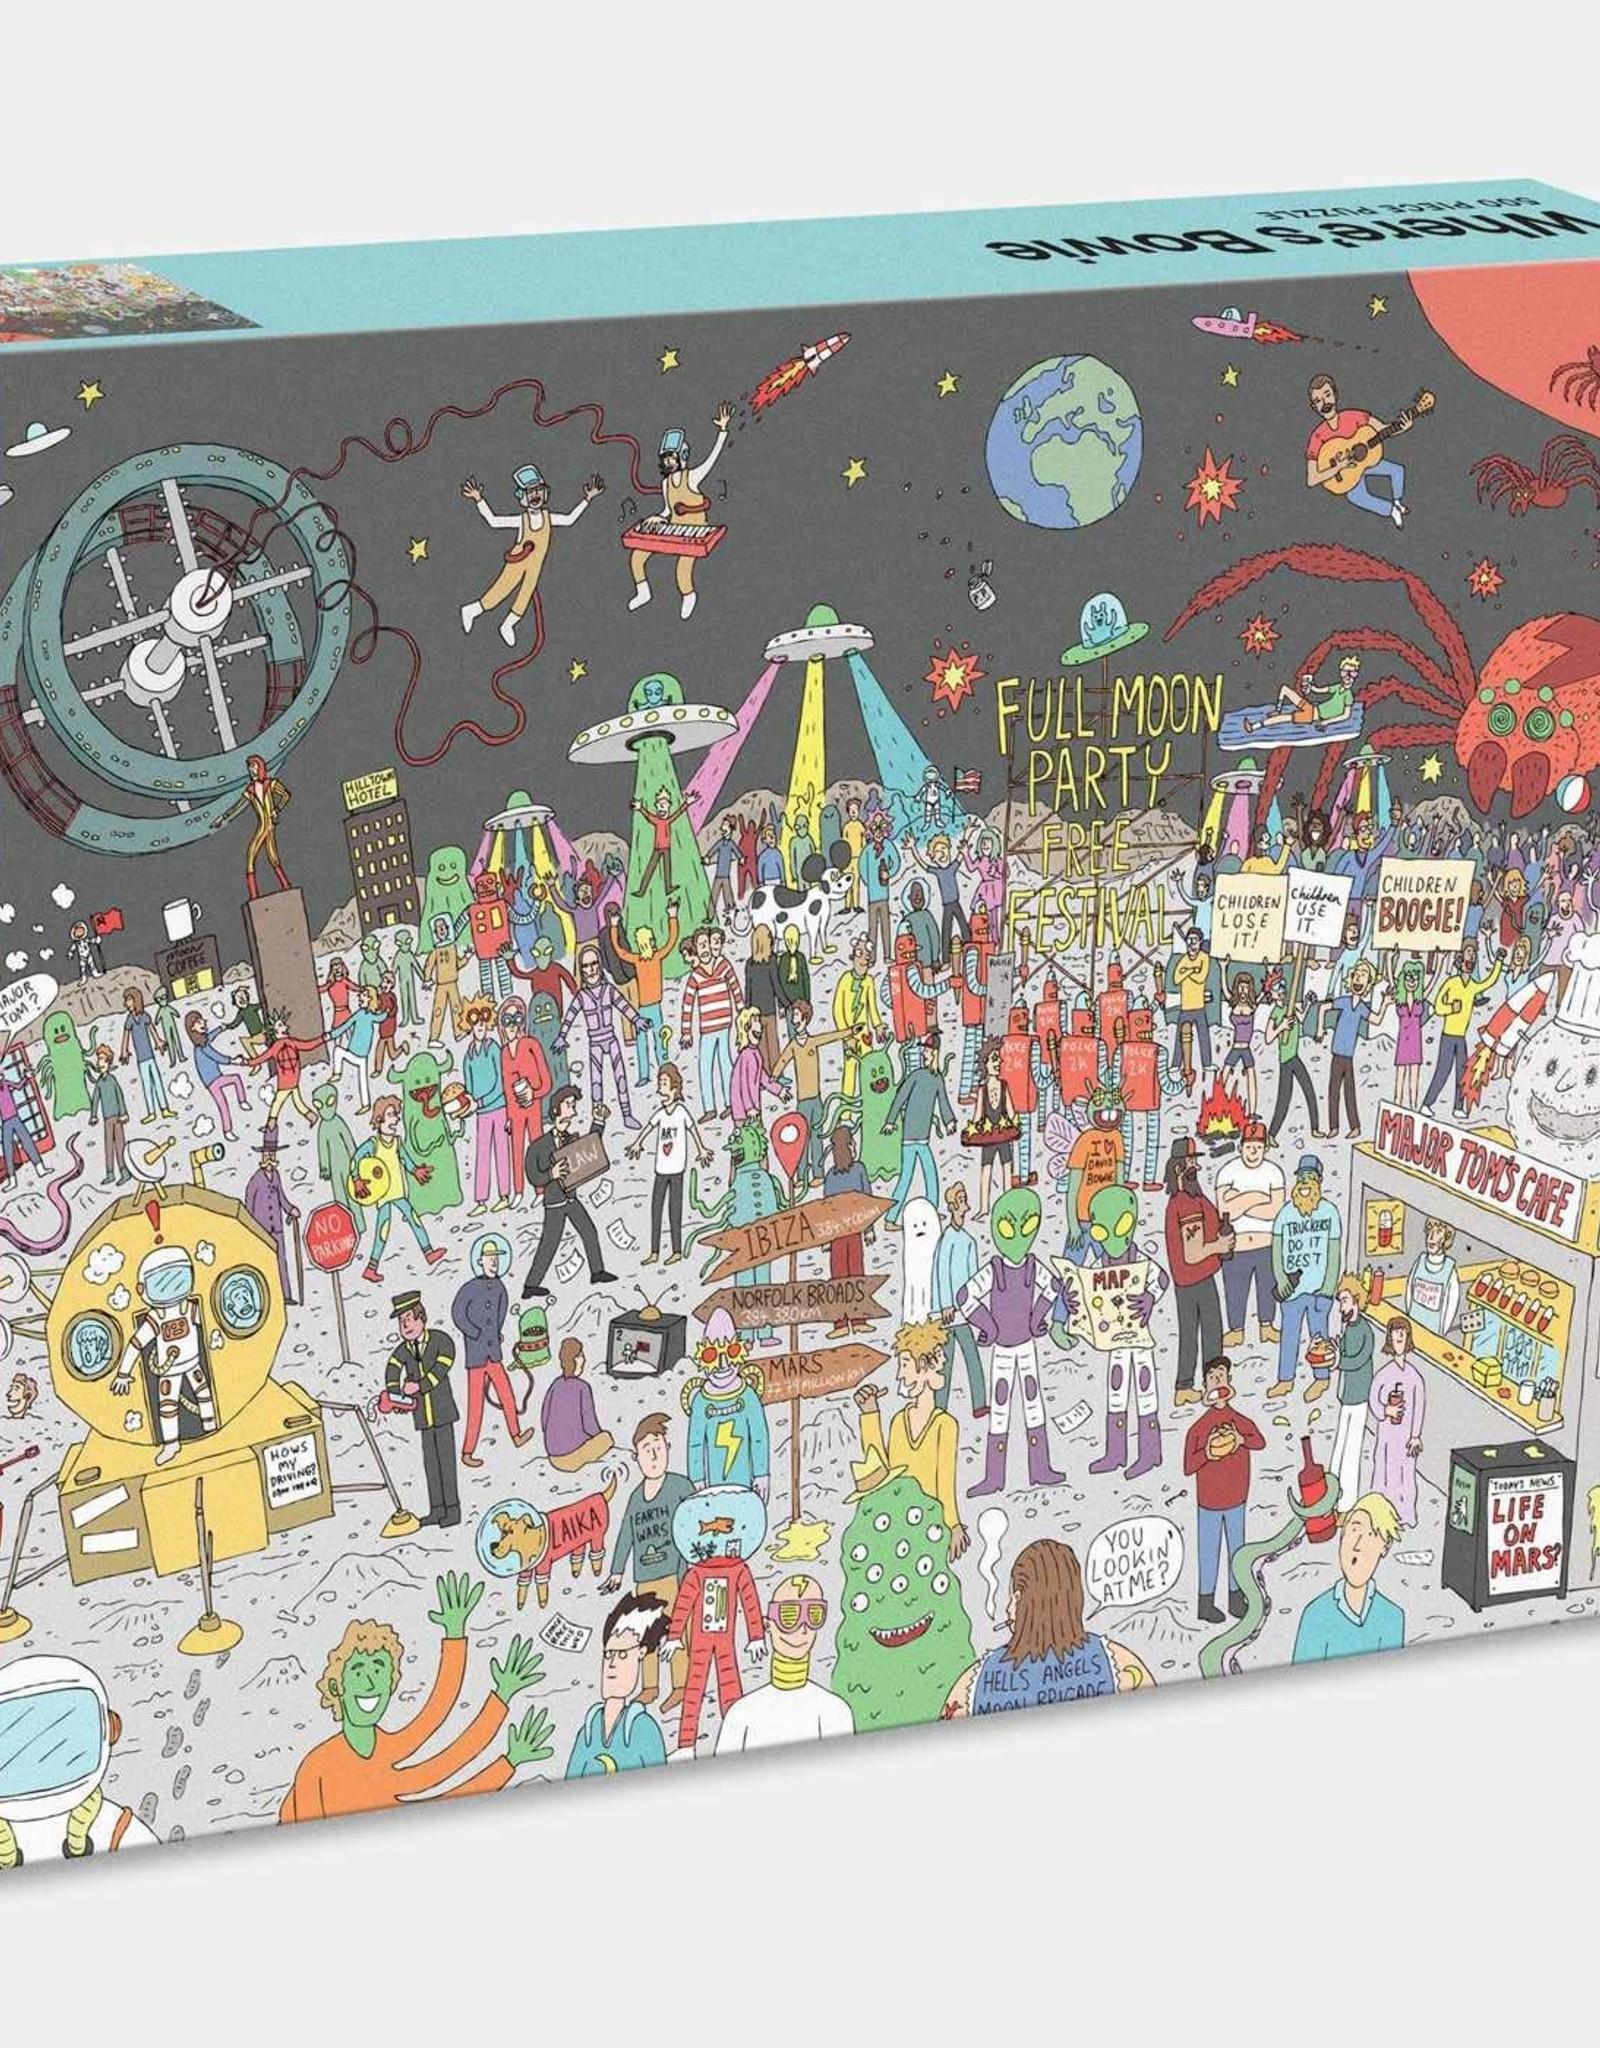 WHERE'S BOWIE 500 PIECE JIGSAW PUZZLE